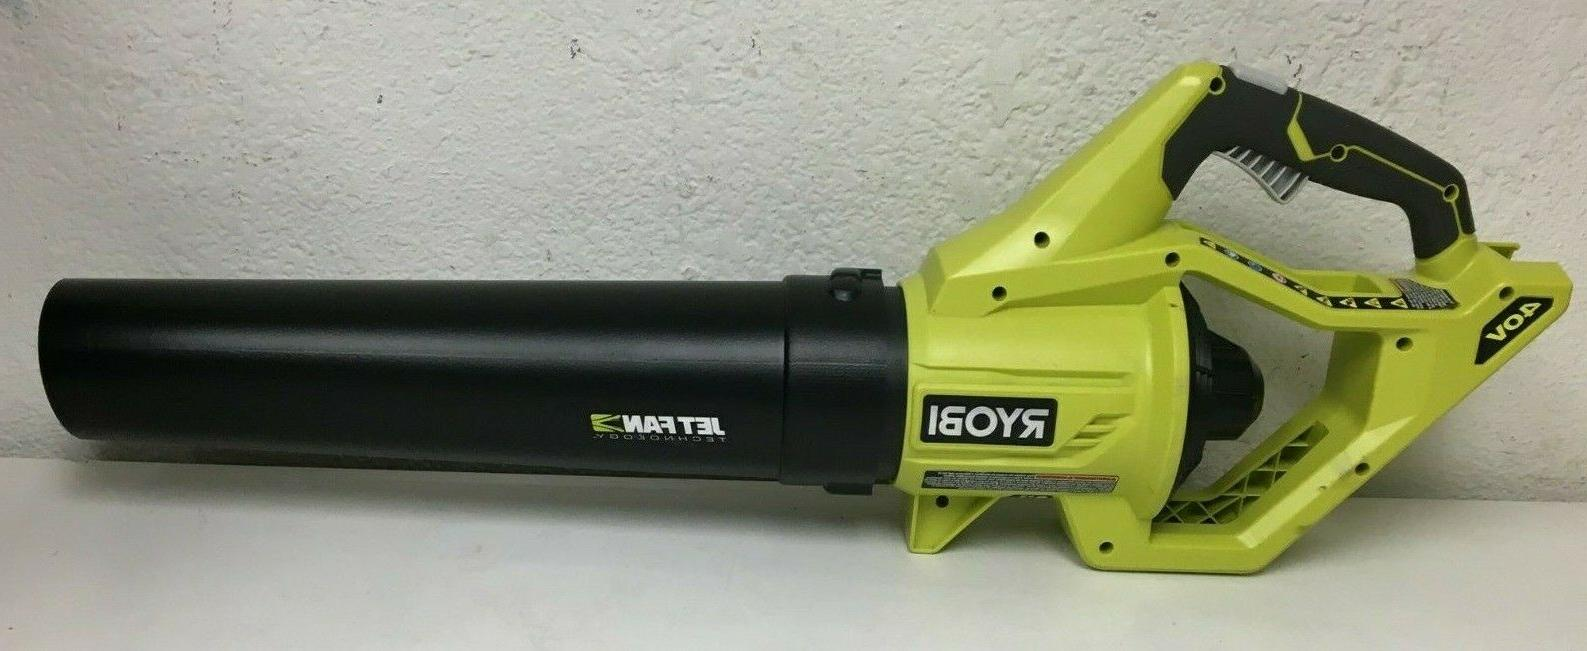 RYOBI 110 MPH 500 40V CORDLESS LEAF BLOWER GR